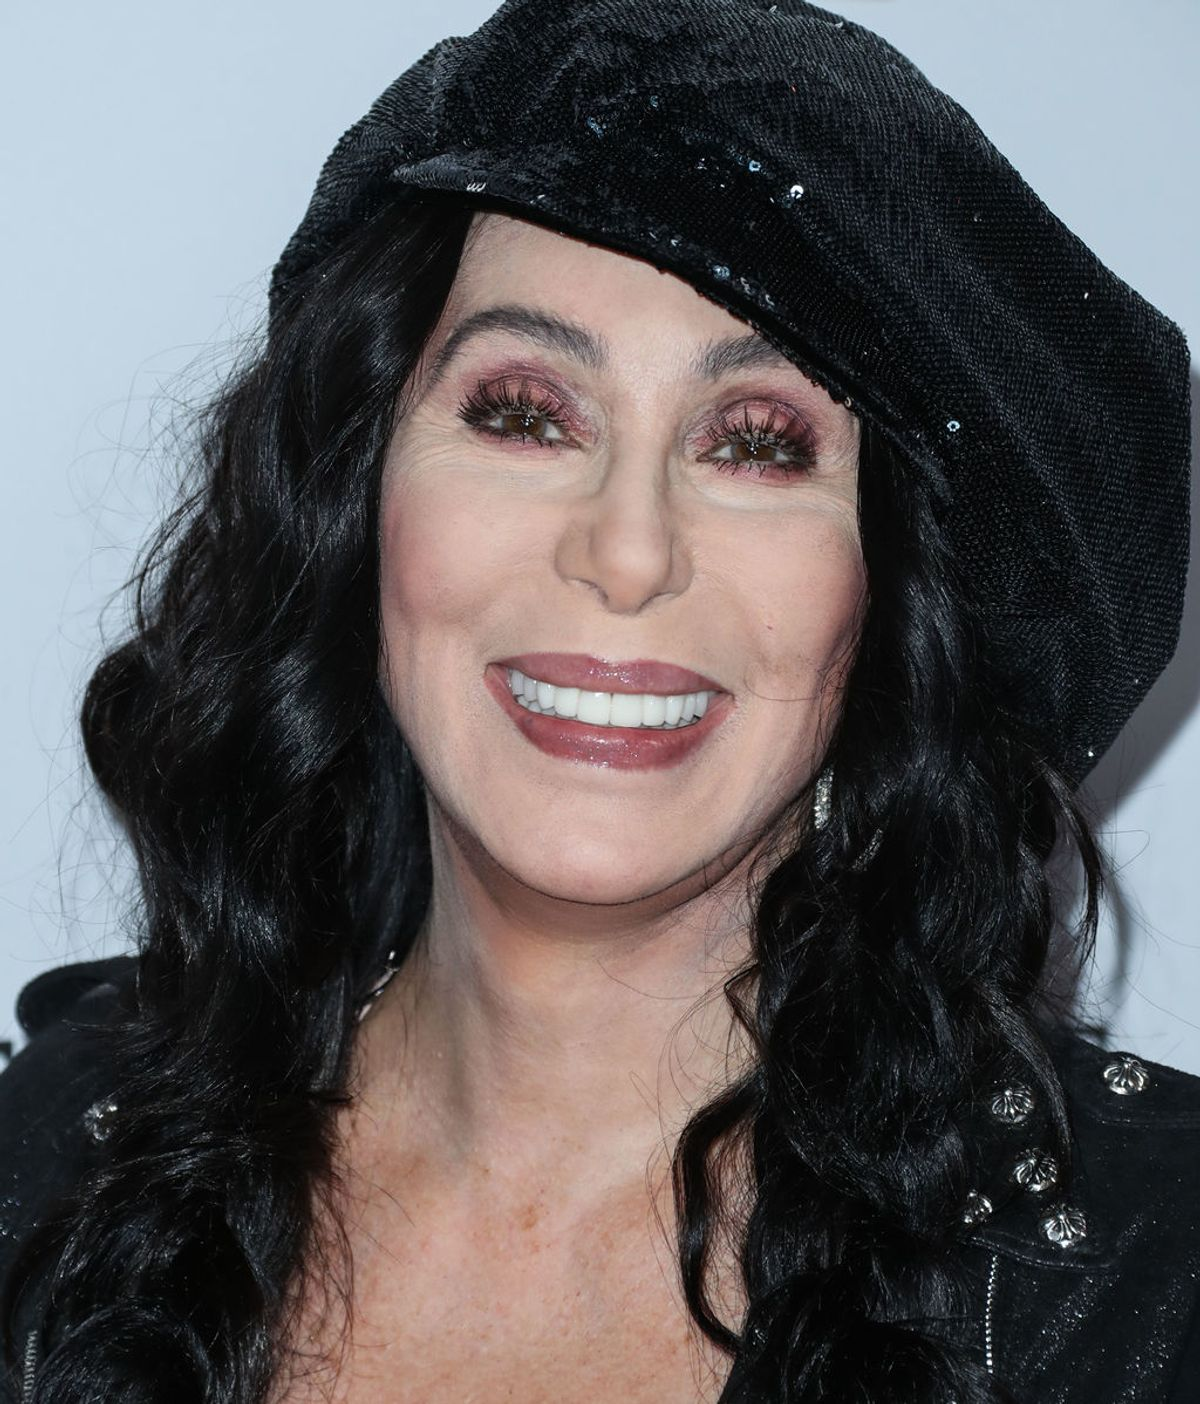 Por qué deberías estar siguiendo a Cher en Twitter